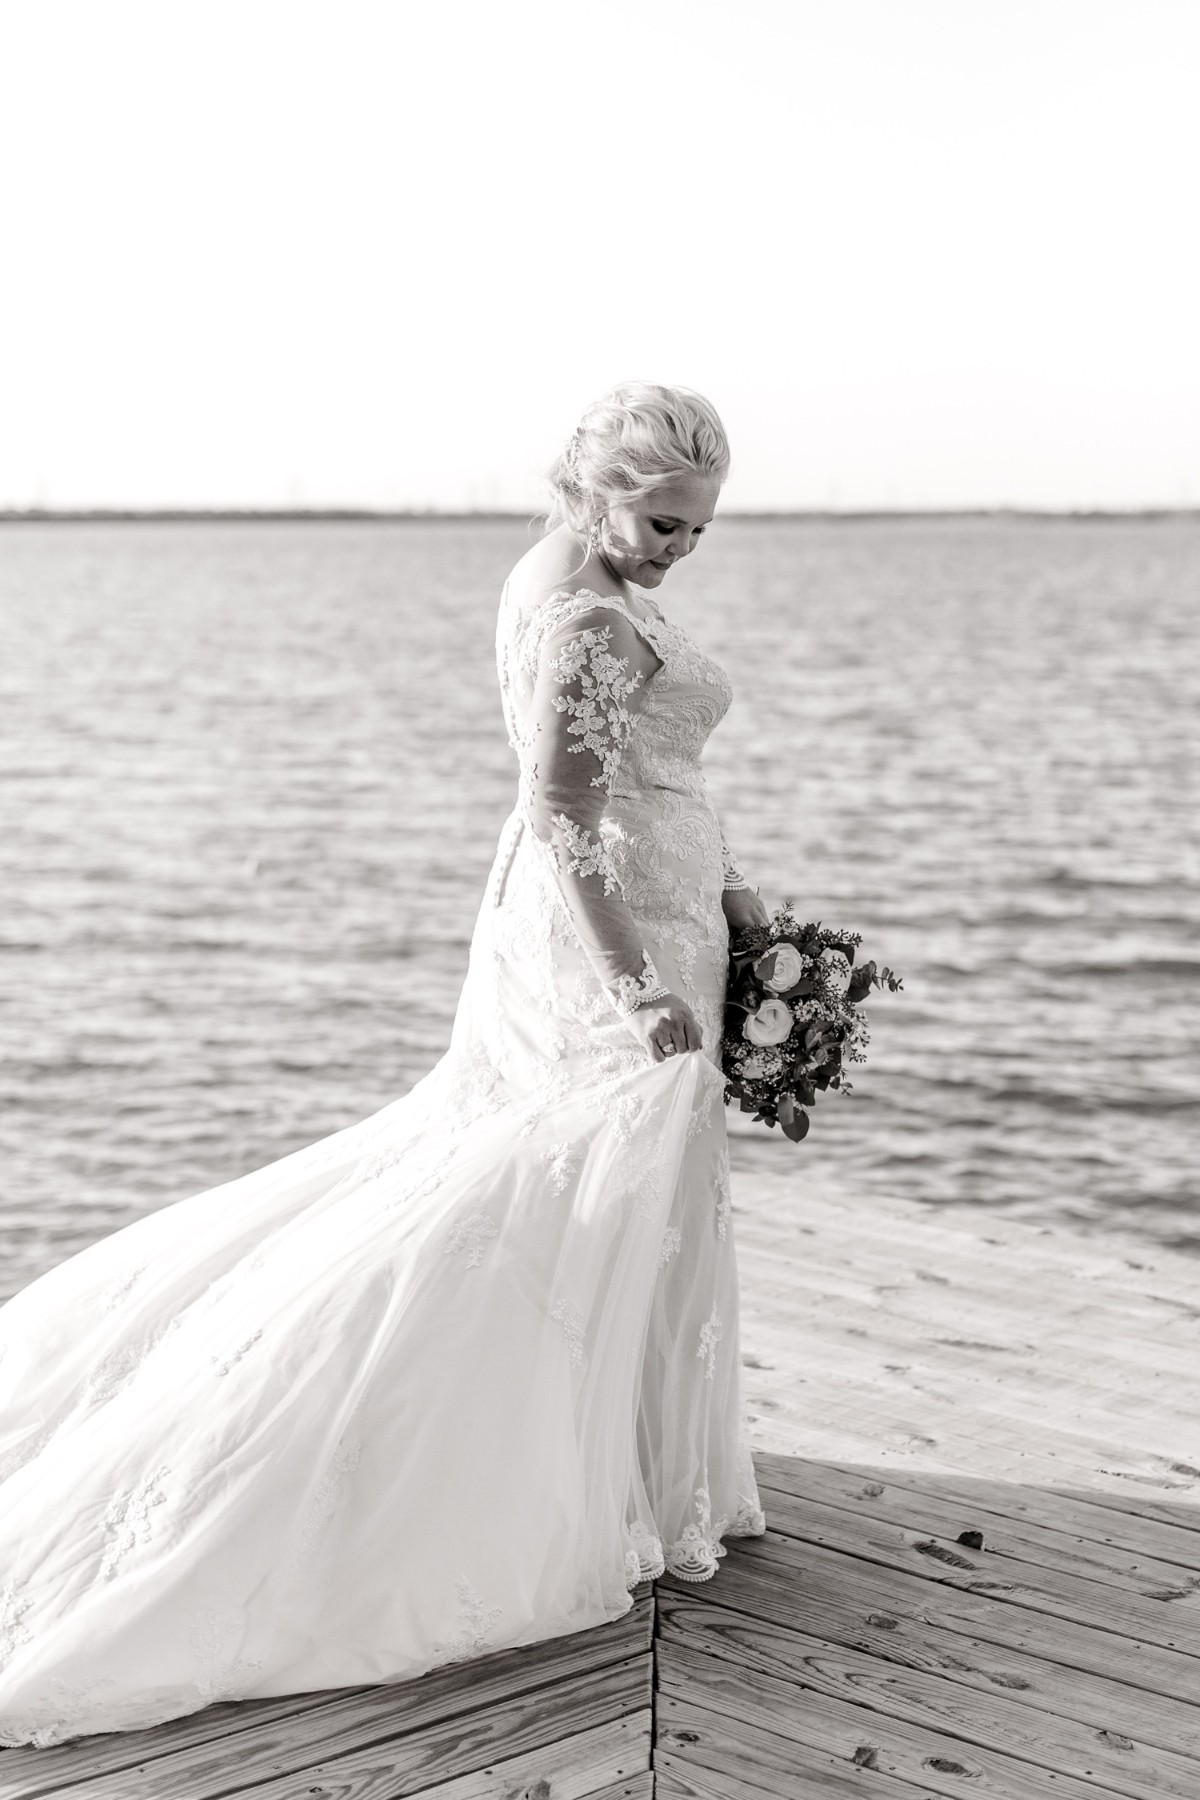 casidy-bridals-tradinghouse-lake-waco-wedding-photographer-kaitlyn-bullard-17.jpg